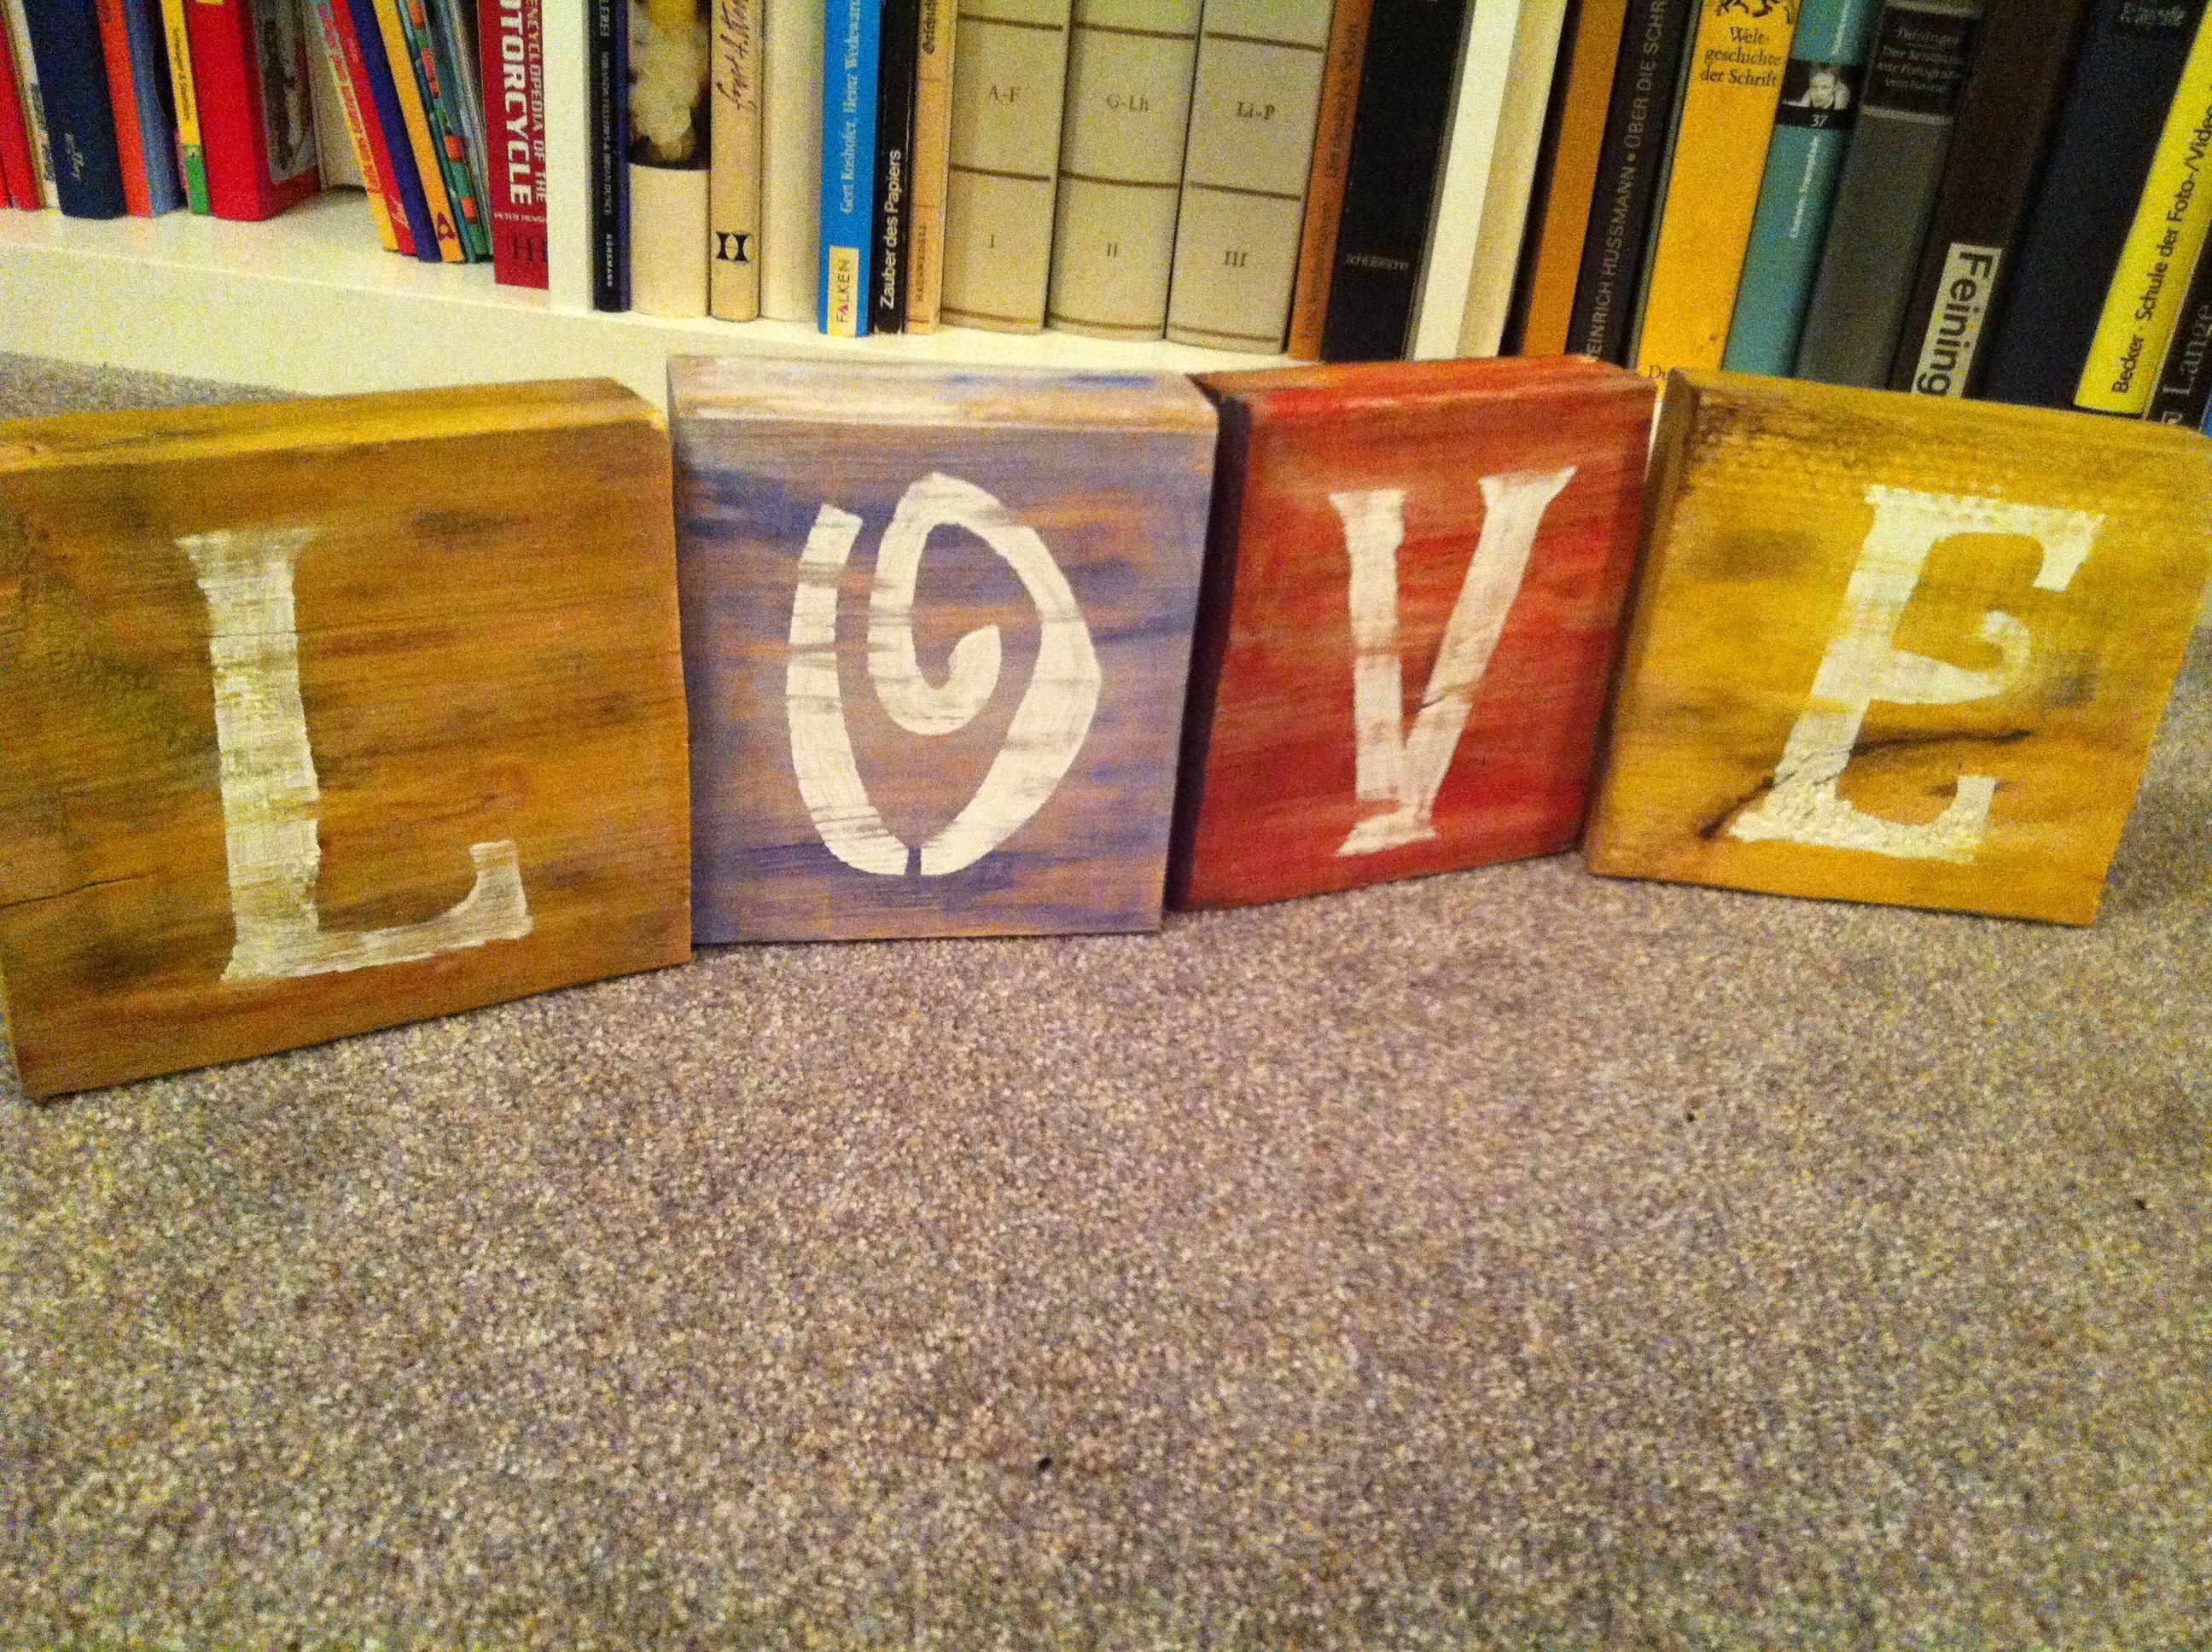 Wooden blocks acrylic paint wood crafts pinterest for Acrylic paint for wood crafts